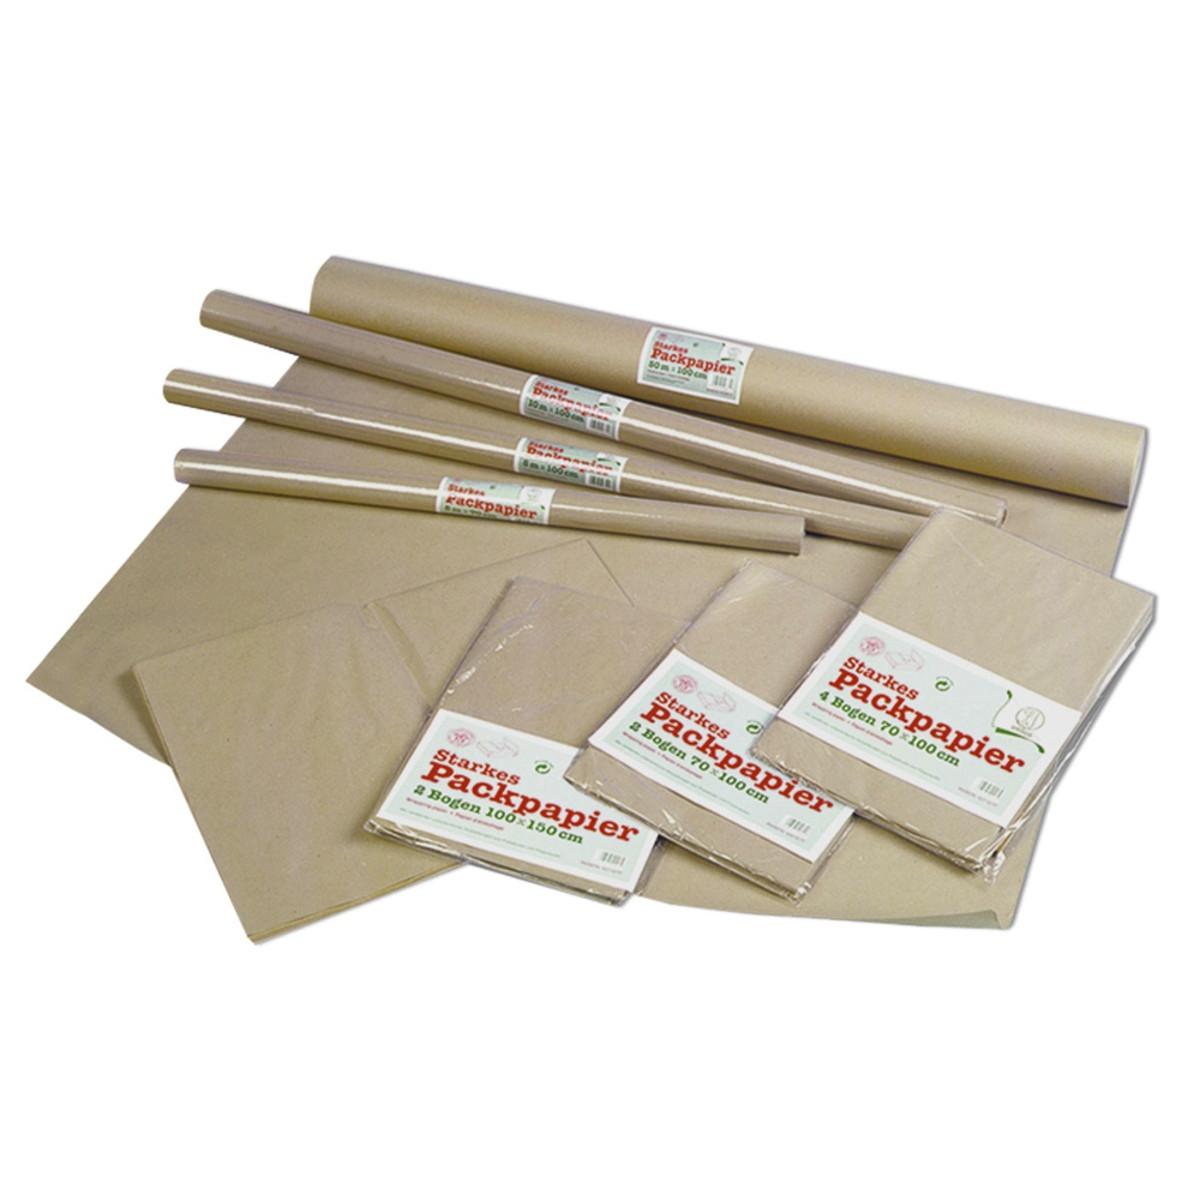 Packpapier 85 g/qm 100 x 150 cm - 2 Bogen